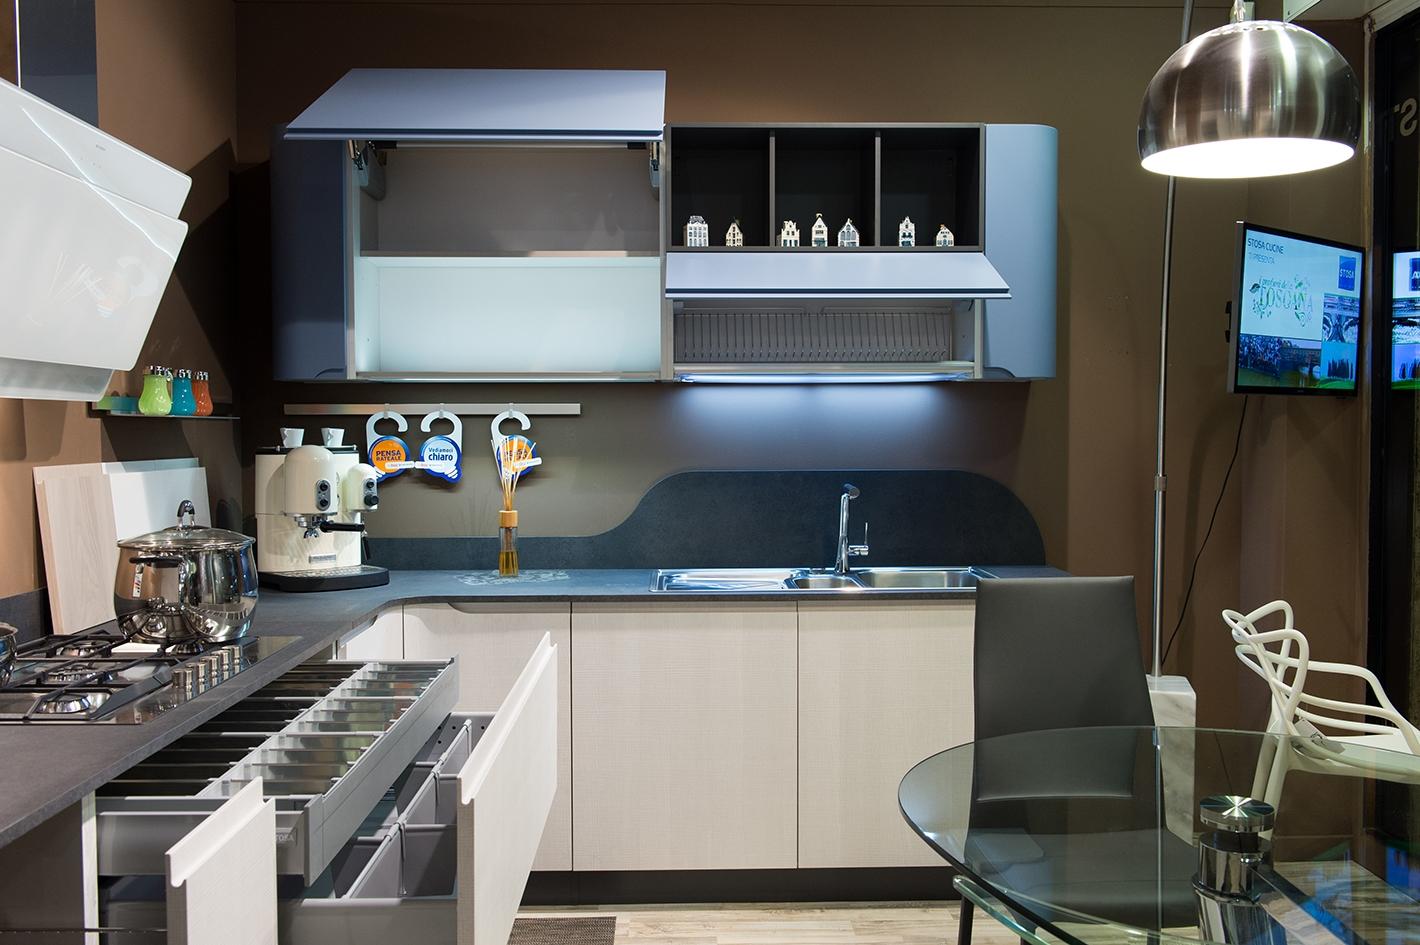 Cucina stosa mod bring completa di elettrodomestici 19270 cucine a prezzi scontati - Cucina stosa prezzi ...